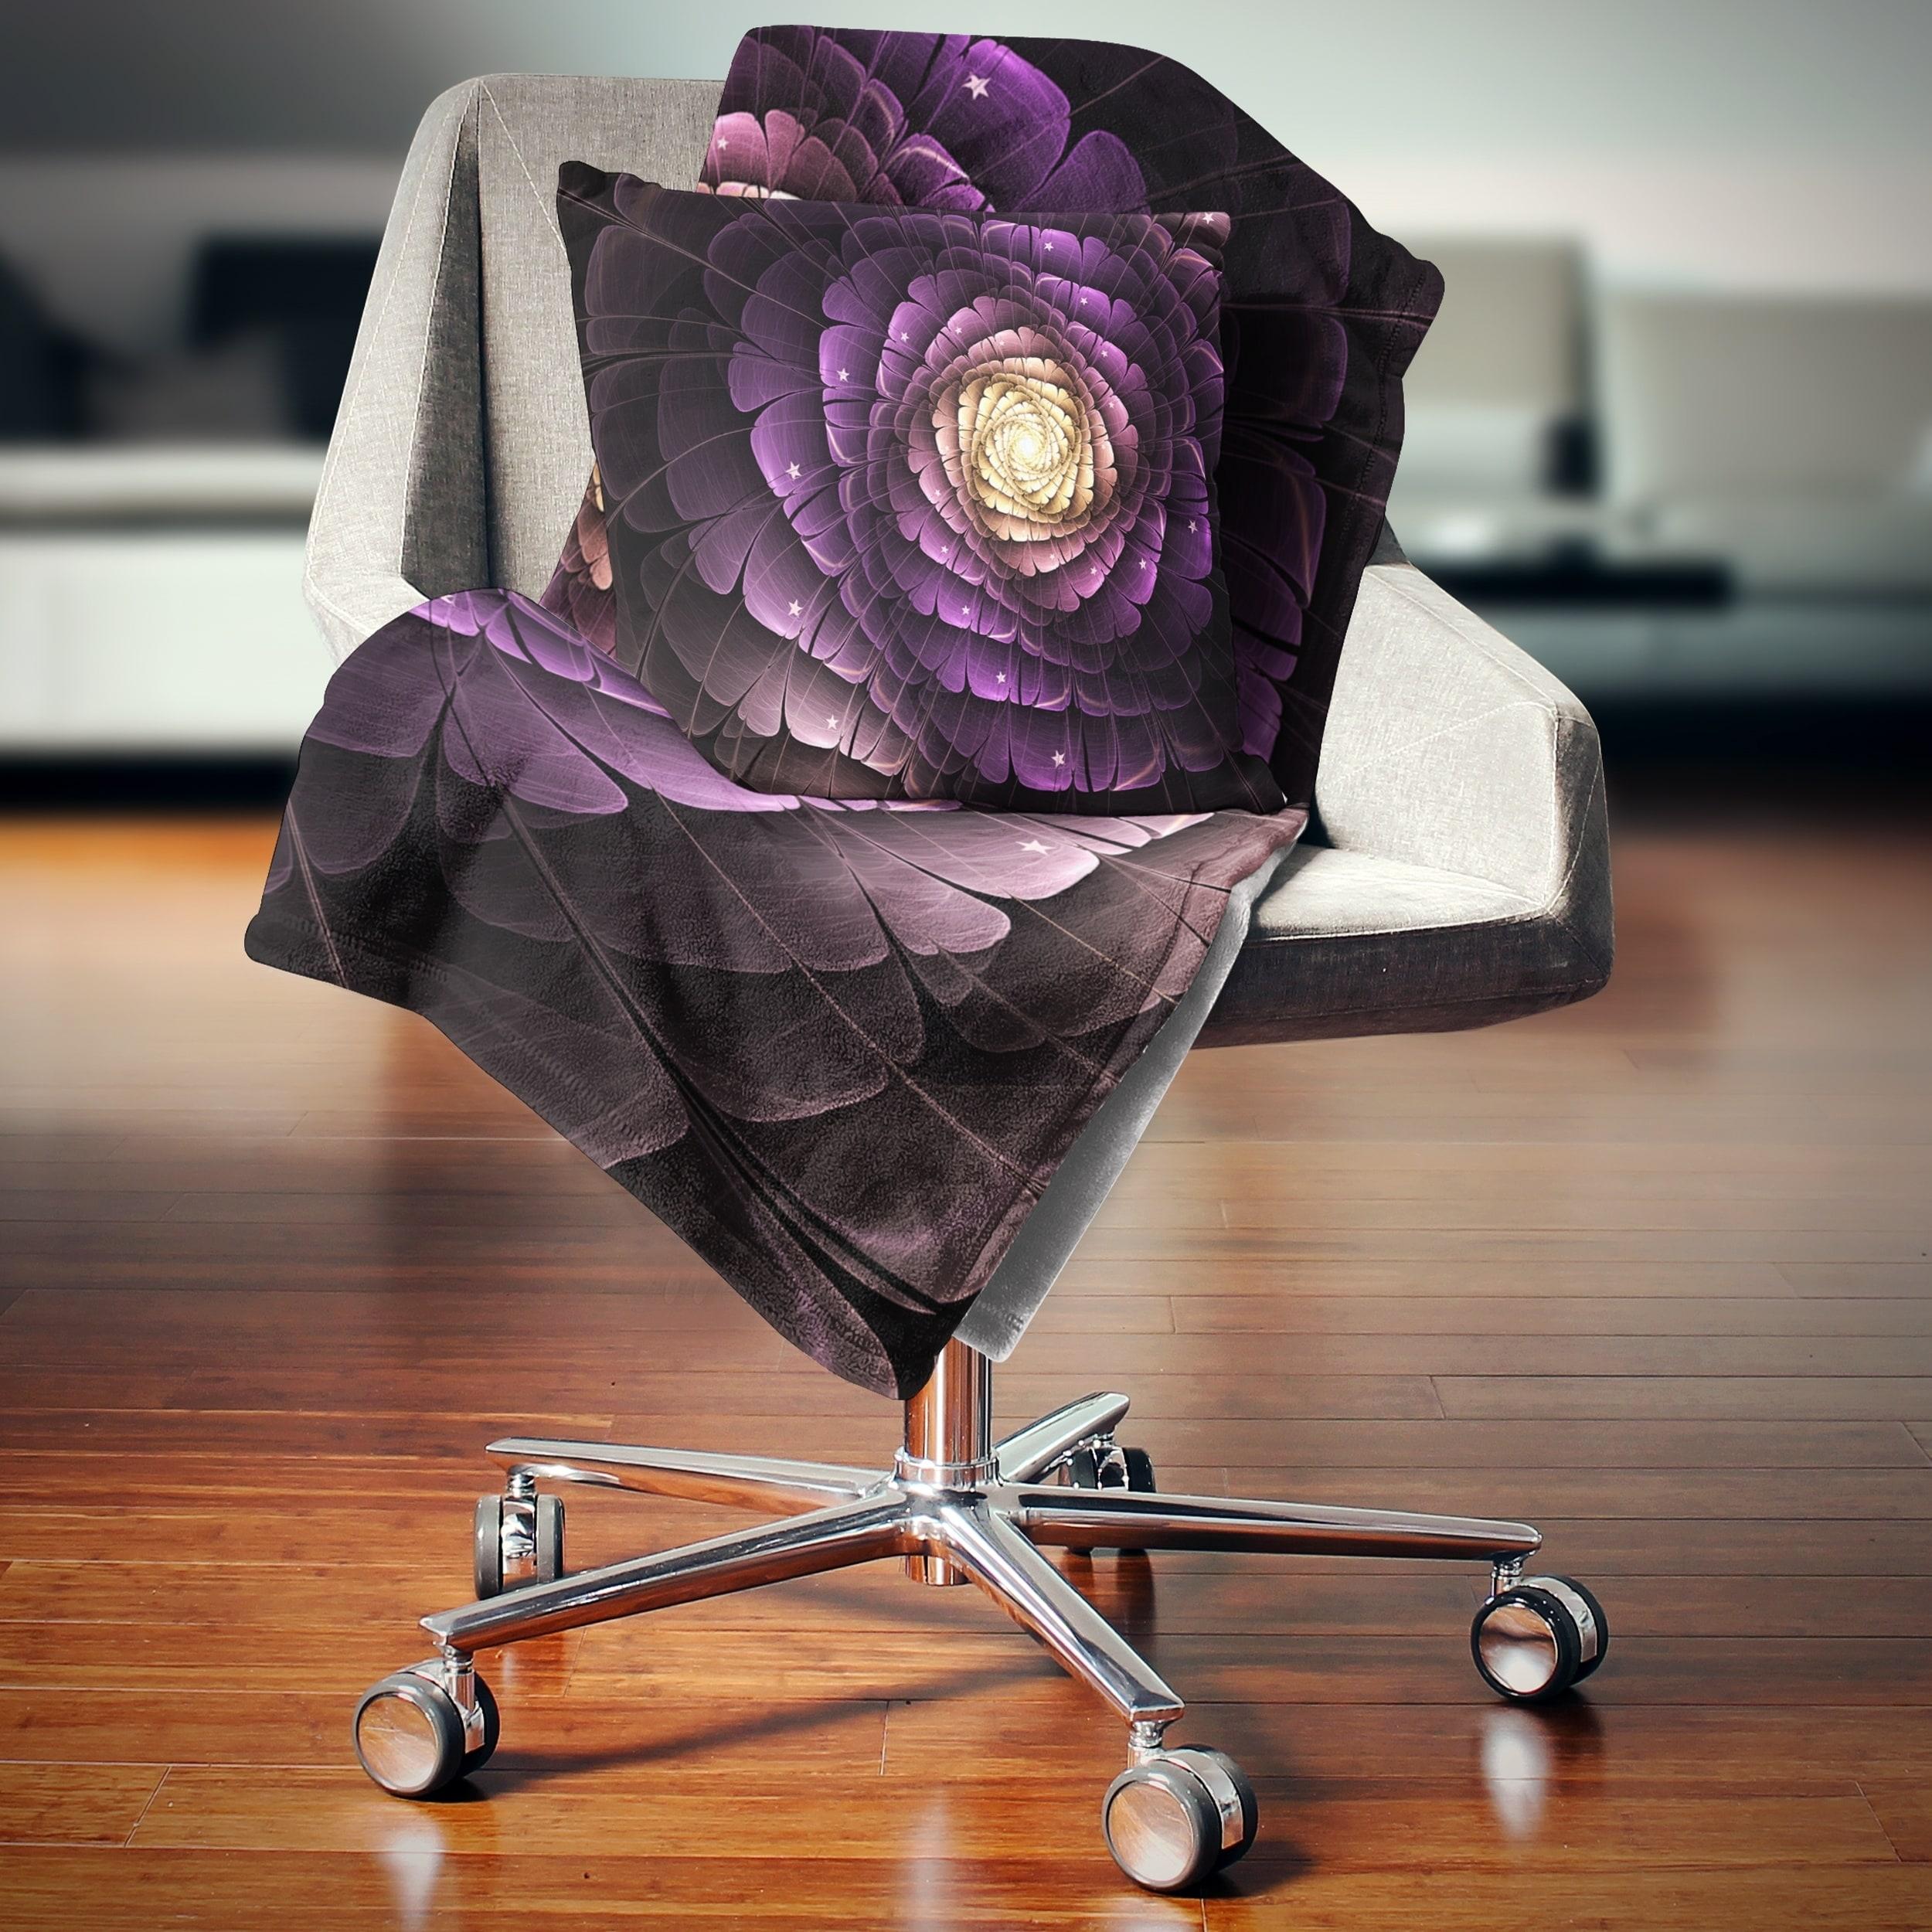 Designart Fractal Flower Light Purple Digital Art Flower Throw Blanket On Sale Overstock 20915660 71 In X 59 In